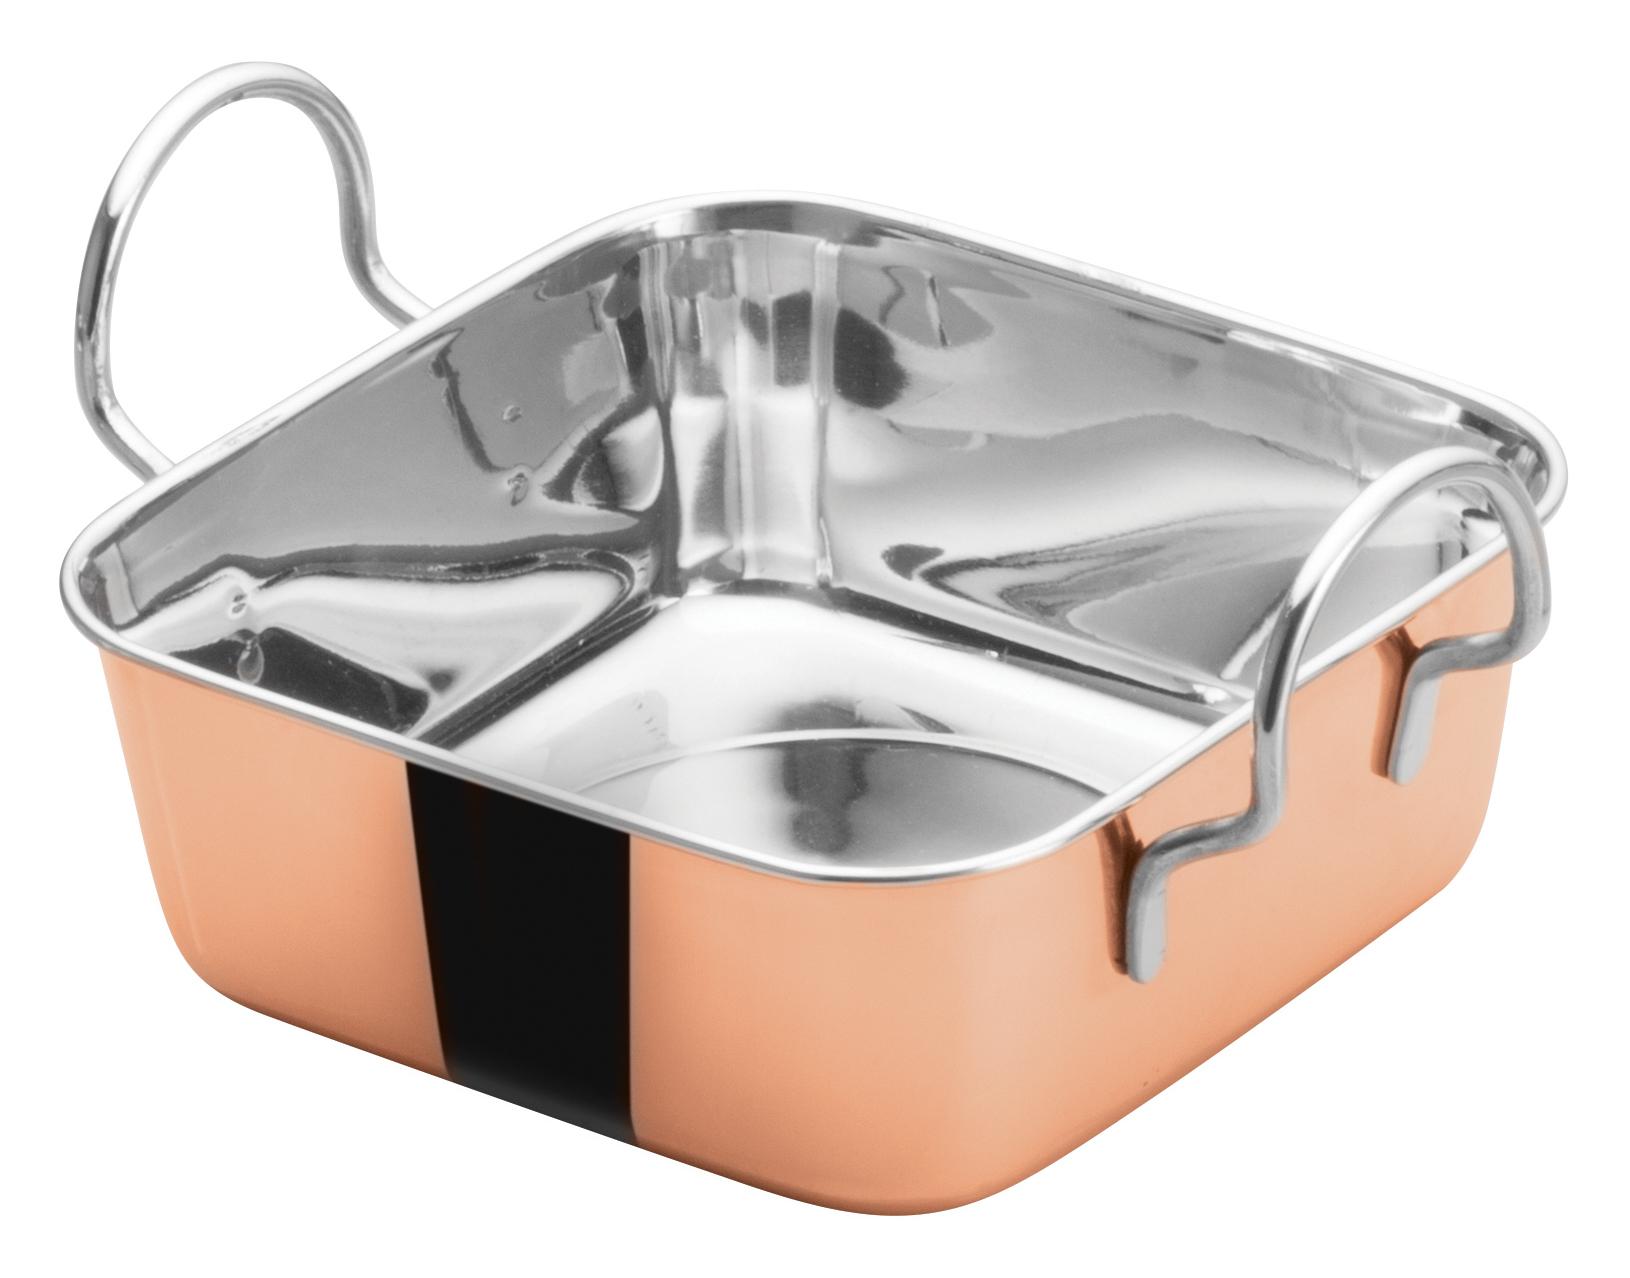 Winco DDSB-201C roasting pan